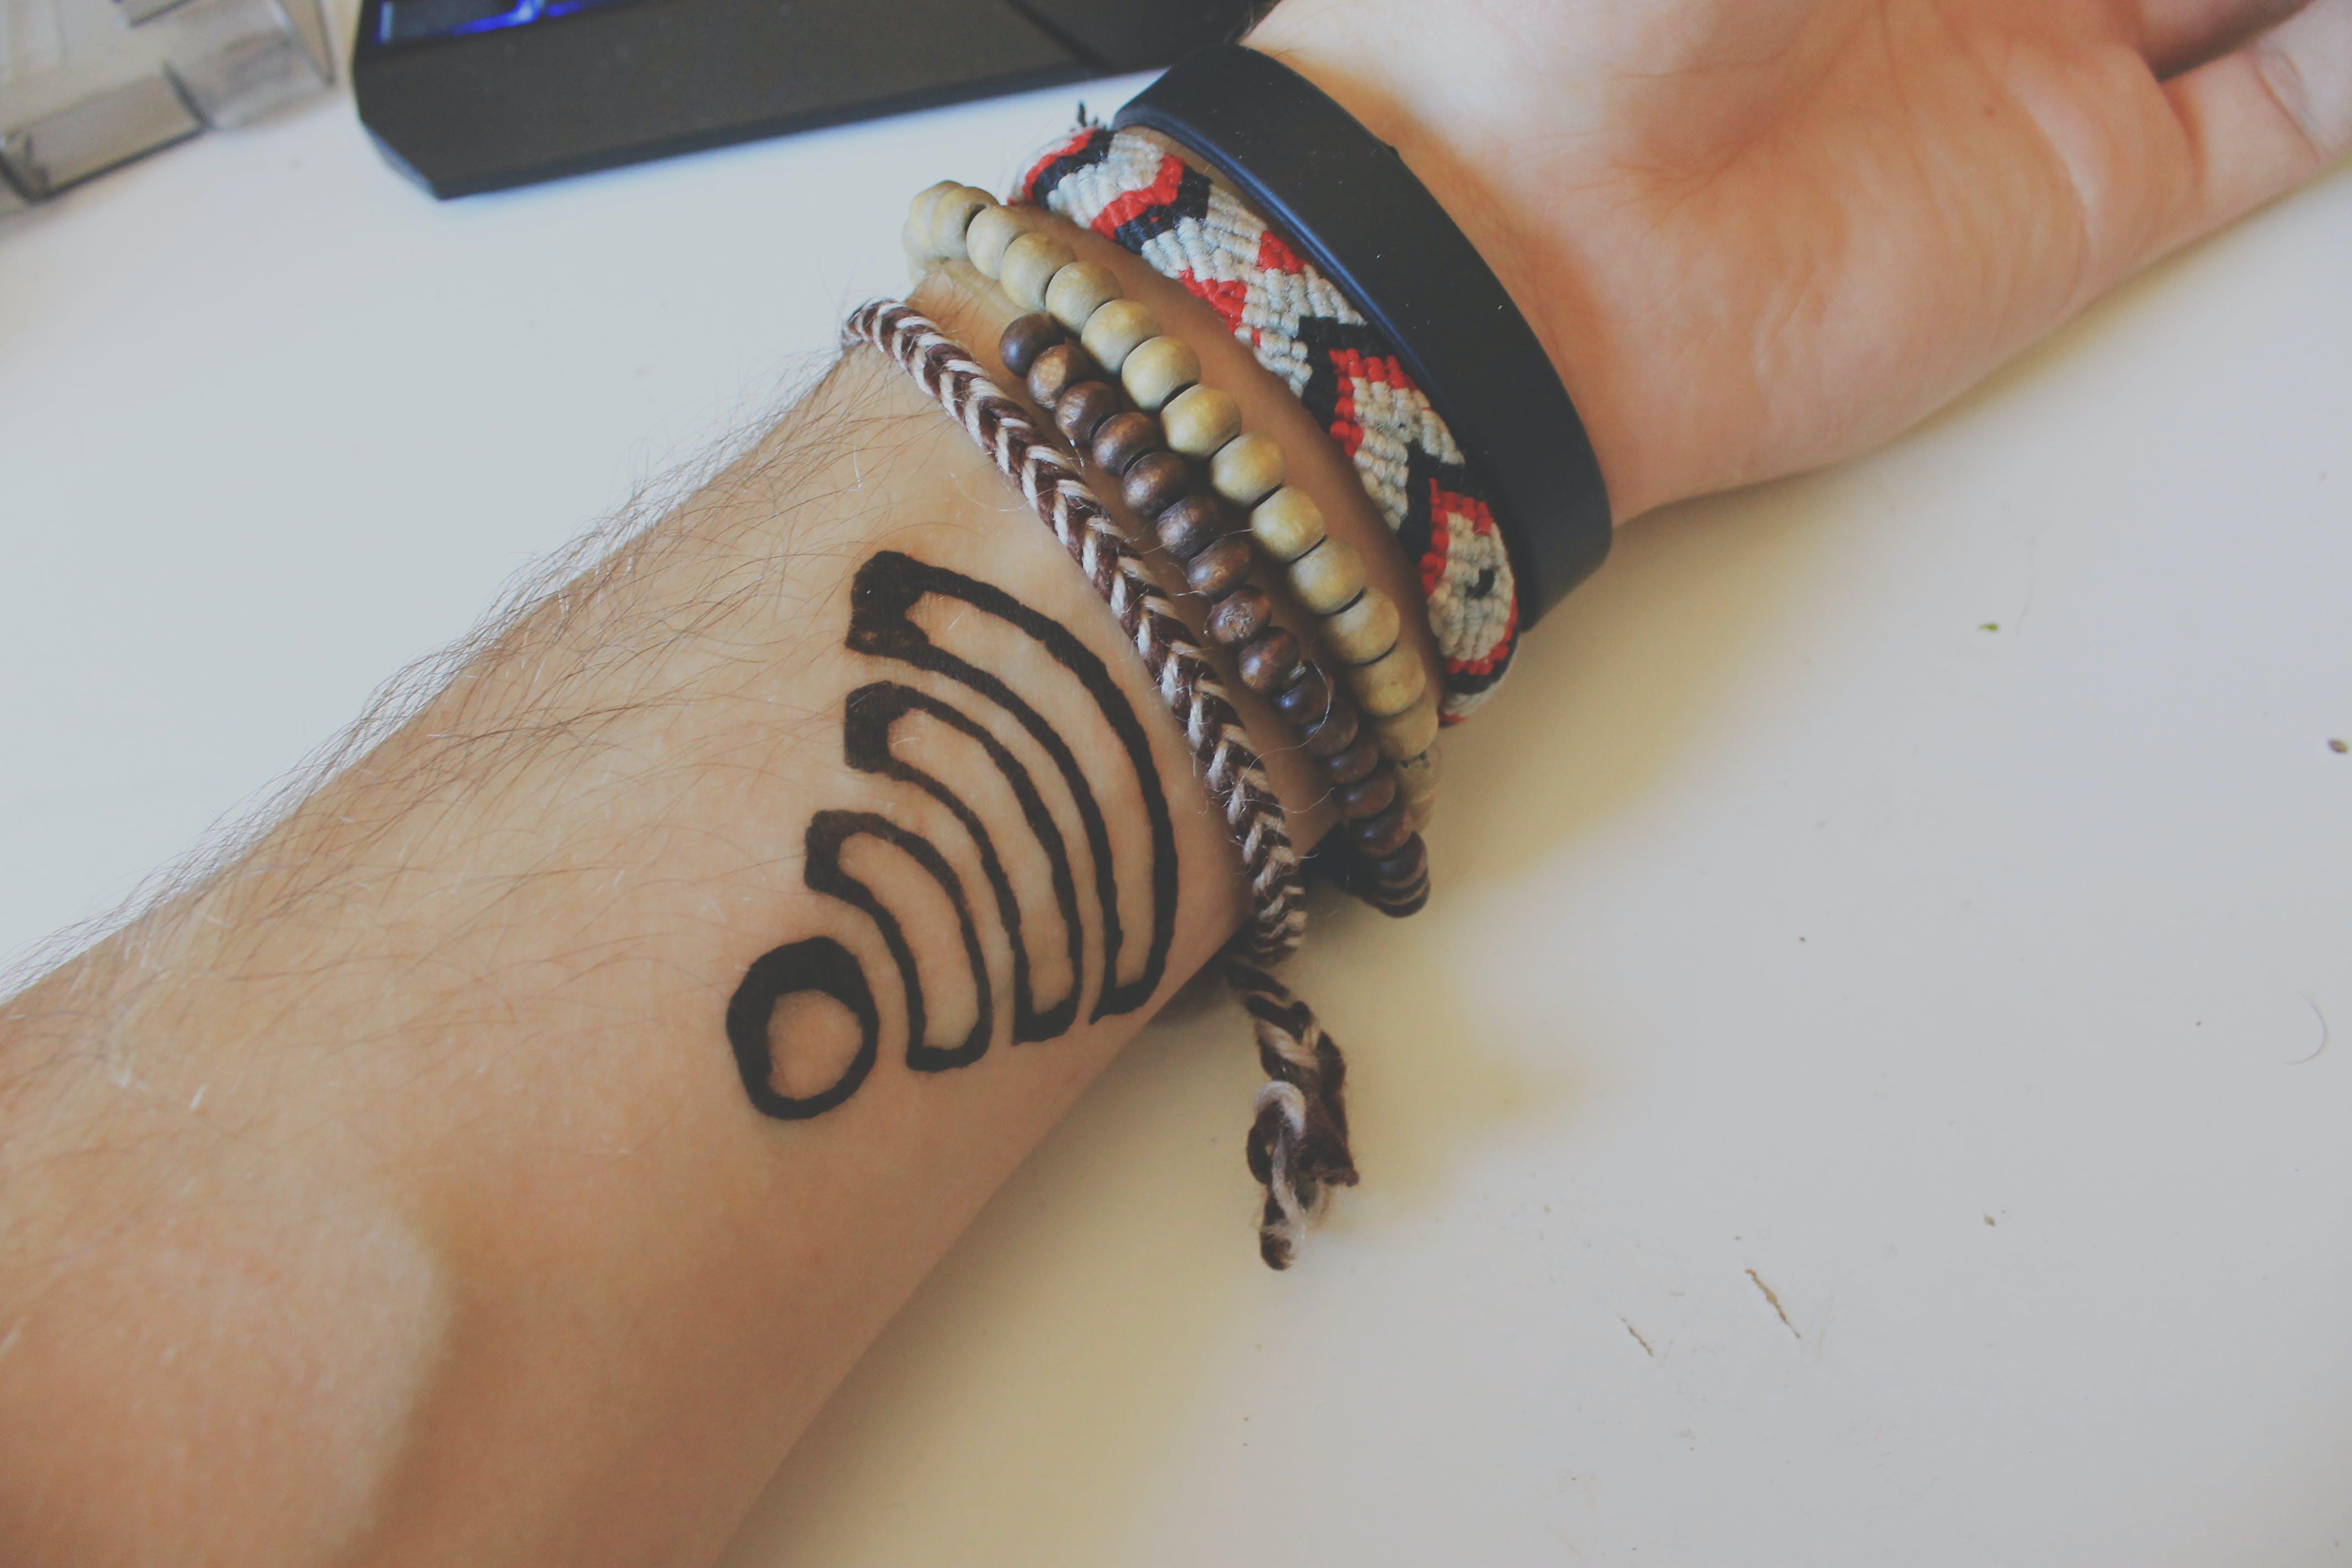 Free stock photo of arm, hand, internet, tattoo